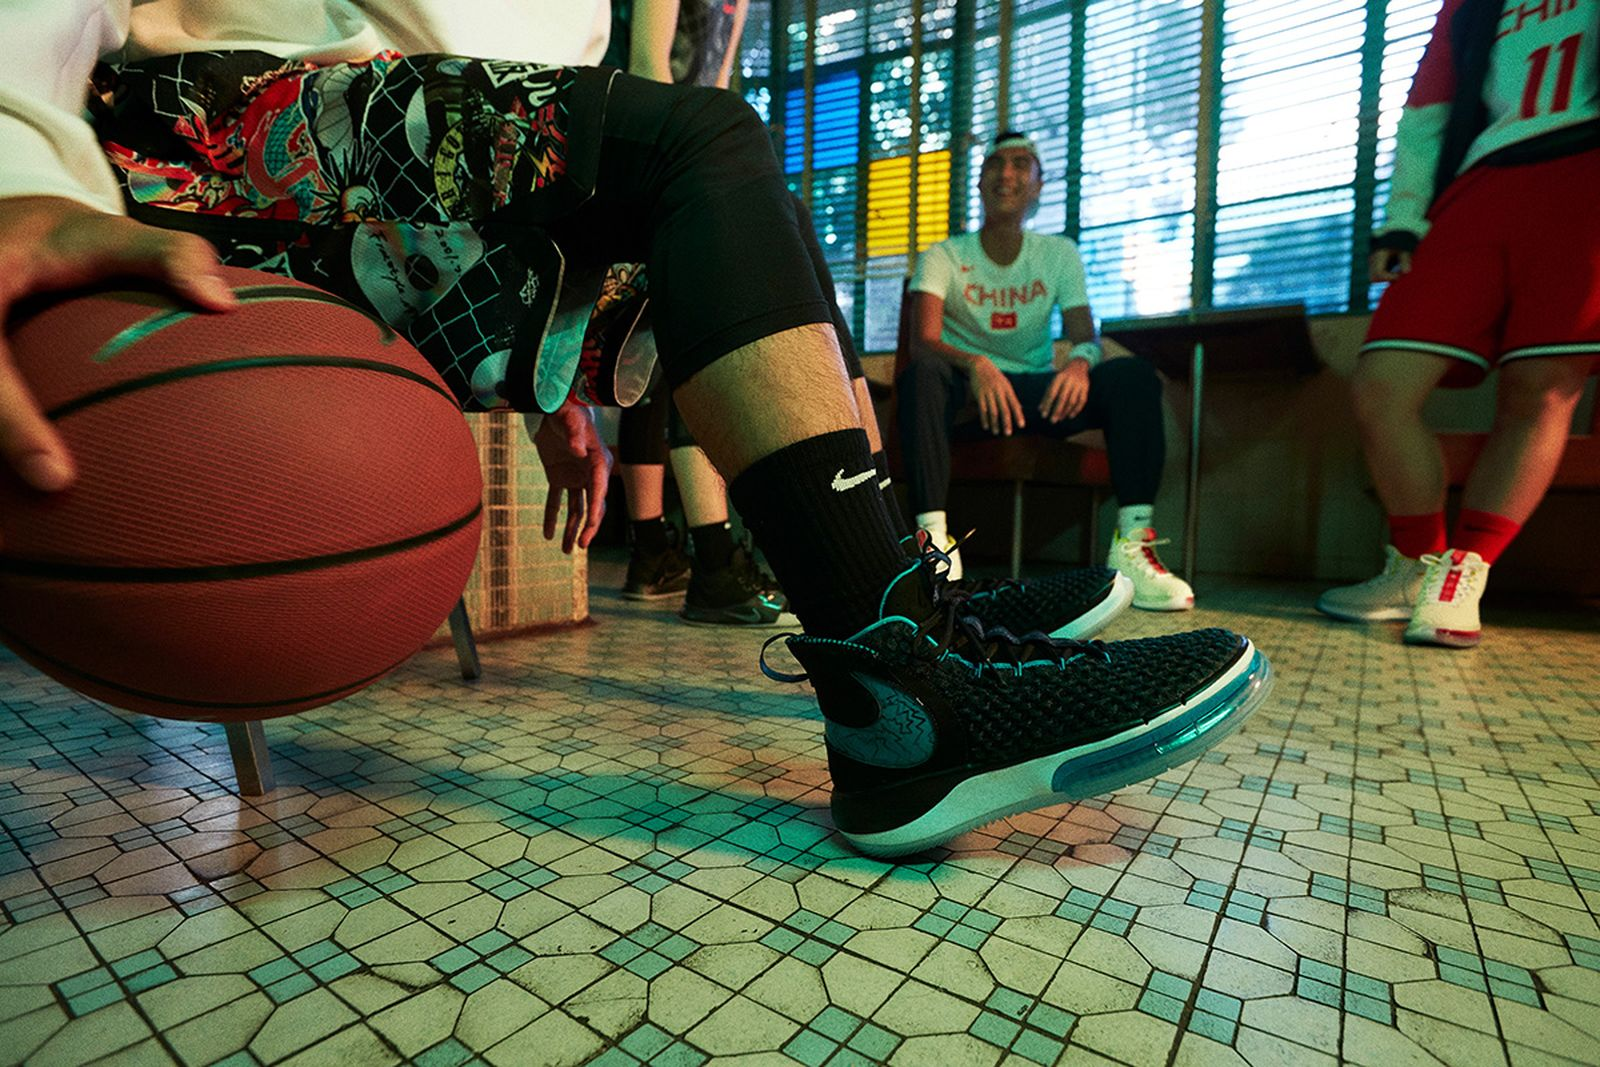 nike china hoop dreams apparel